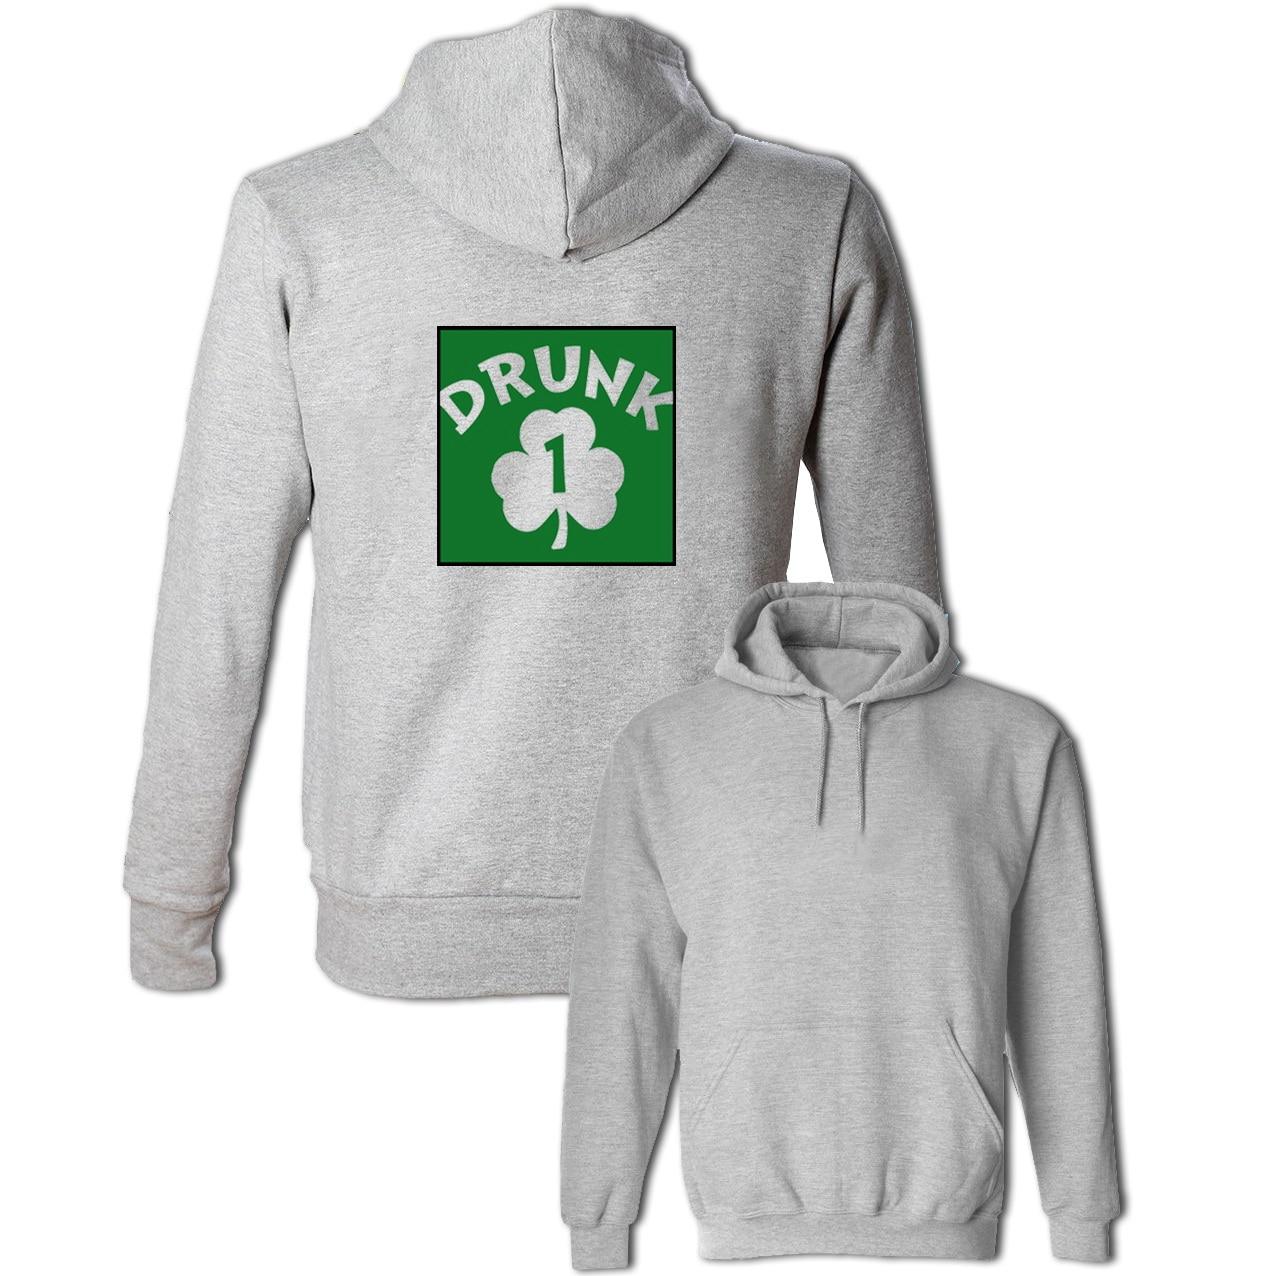 Drunk 1 Shamrock Irish Hoodie Mens Womens Boys Girls Sweatshirt Special Design Long Sleeve Pullover Tops Fashion Unisex Jacket